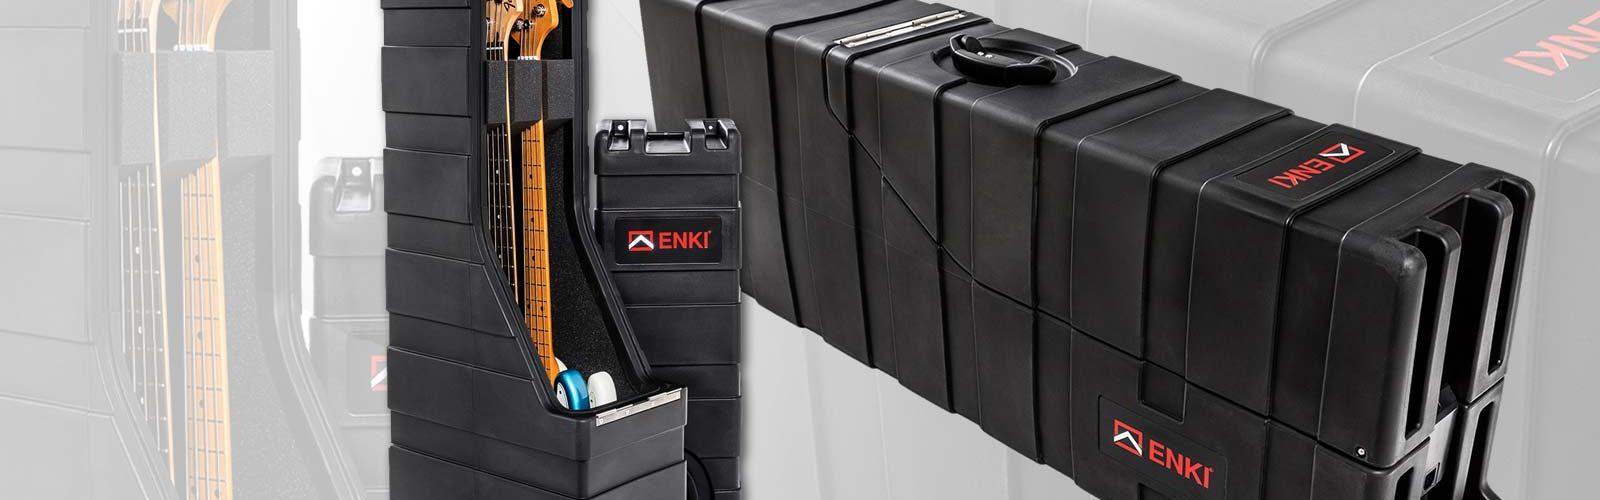 ENKI AMG-2 Series Cases Updates